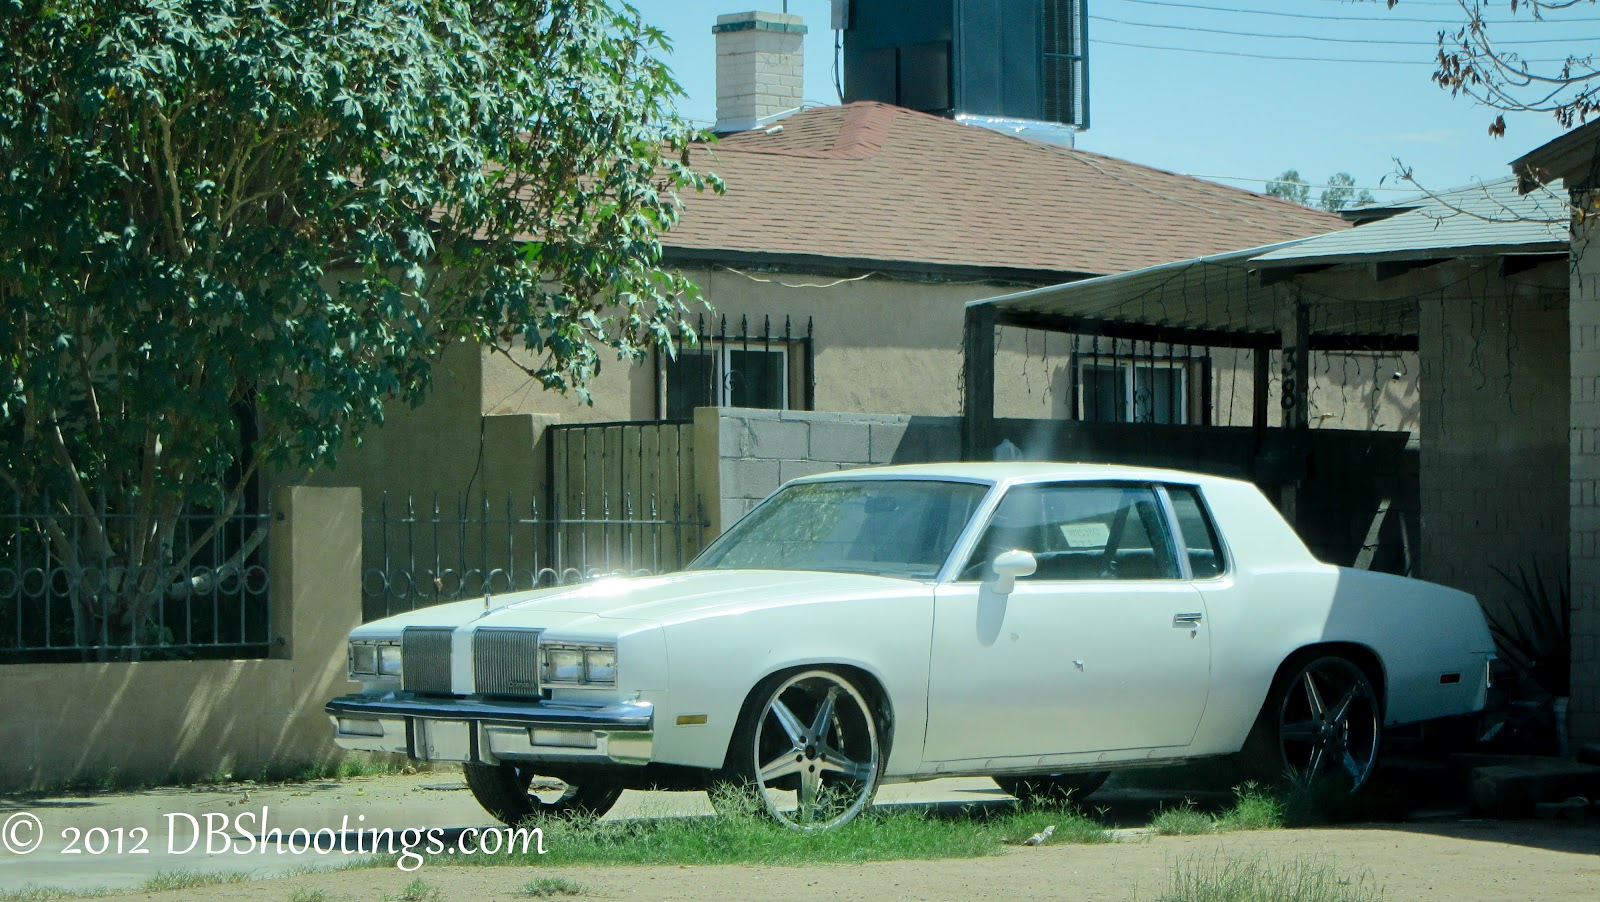 1980 Oldsmovbile Cutlass Supreme donk